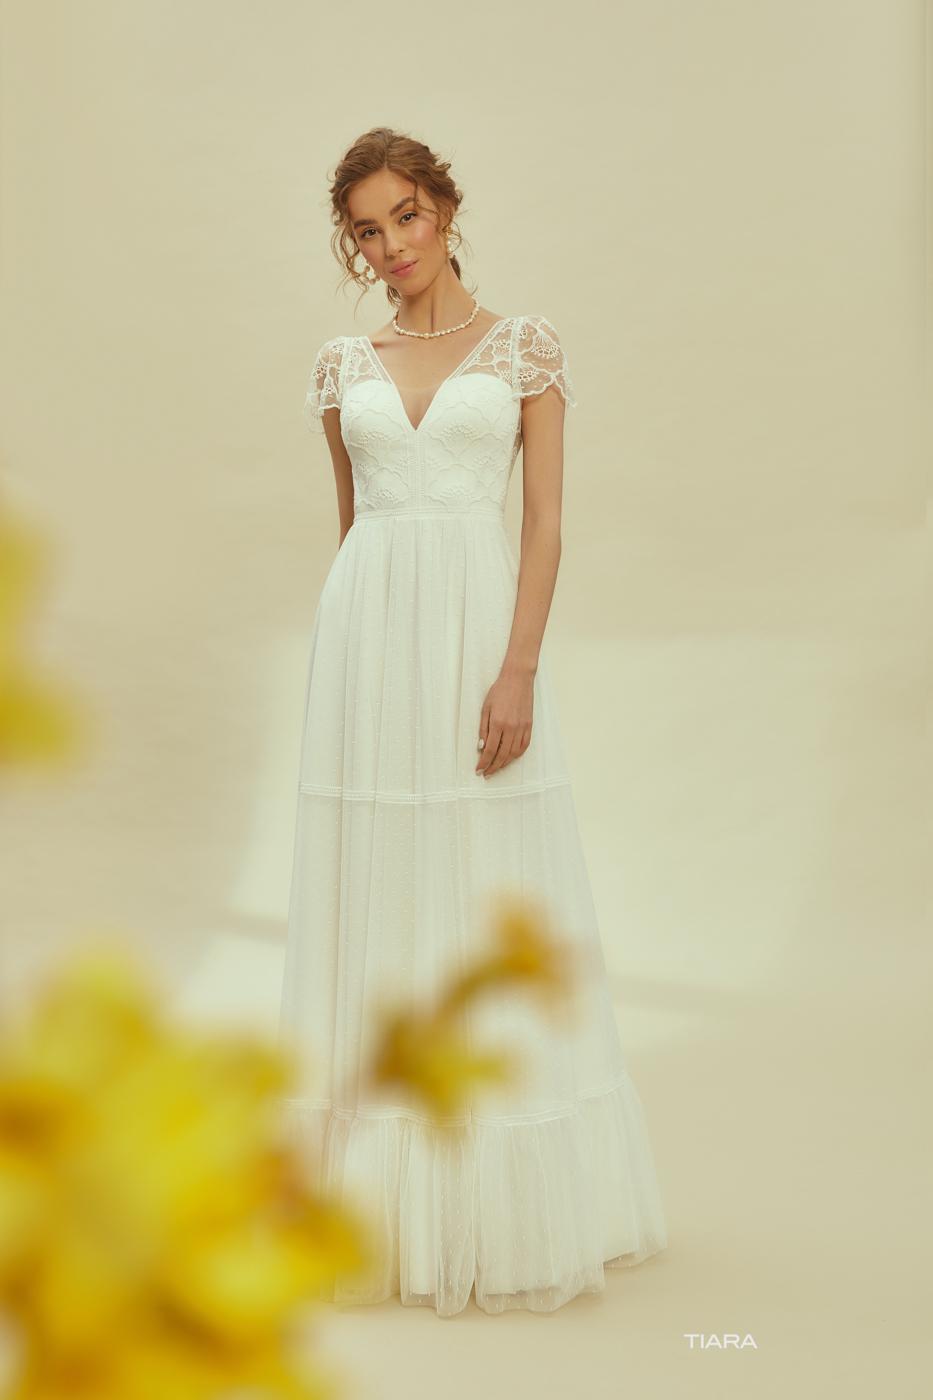 myLovely Brautkleider München ivory Boho Brautkleid besonders fließend elegant grobe Spitze